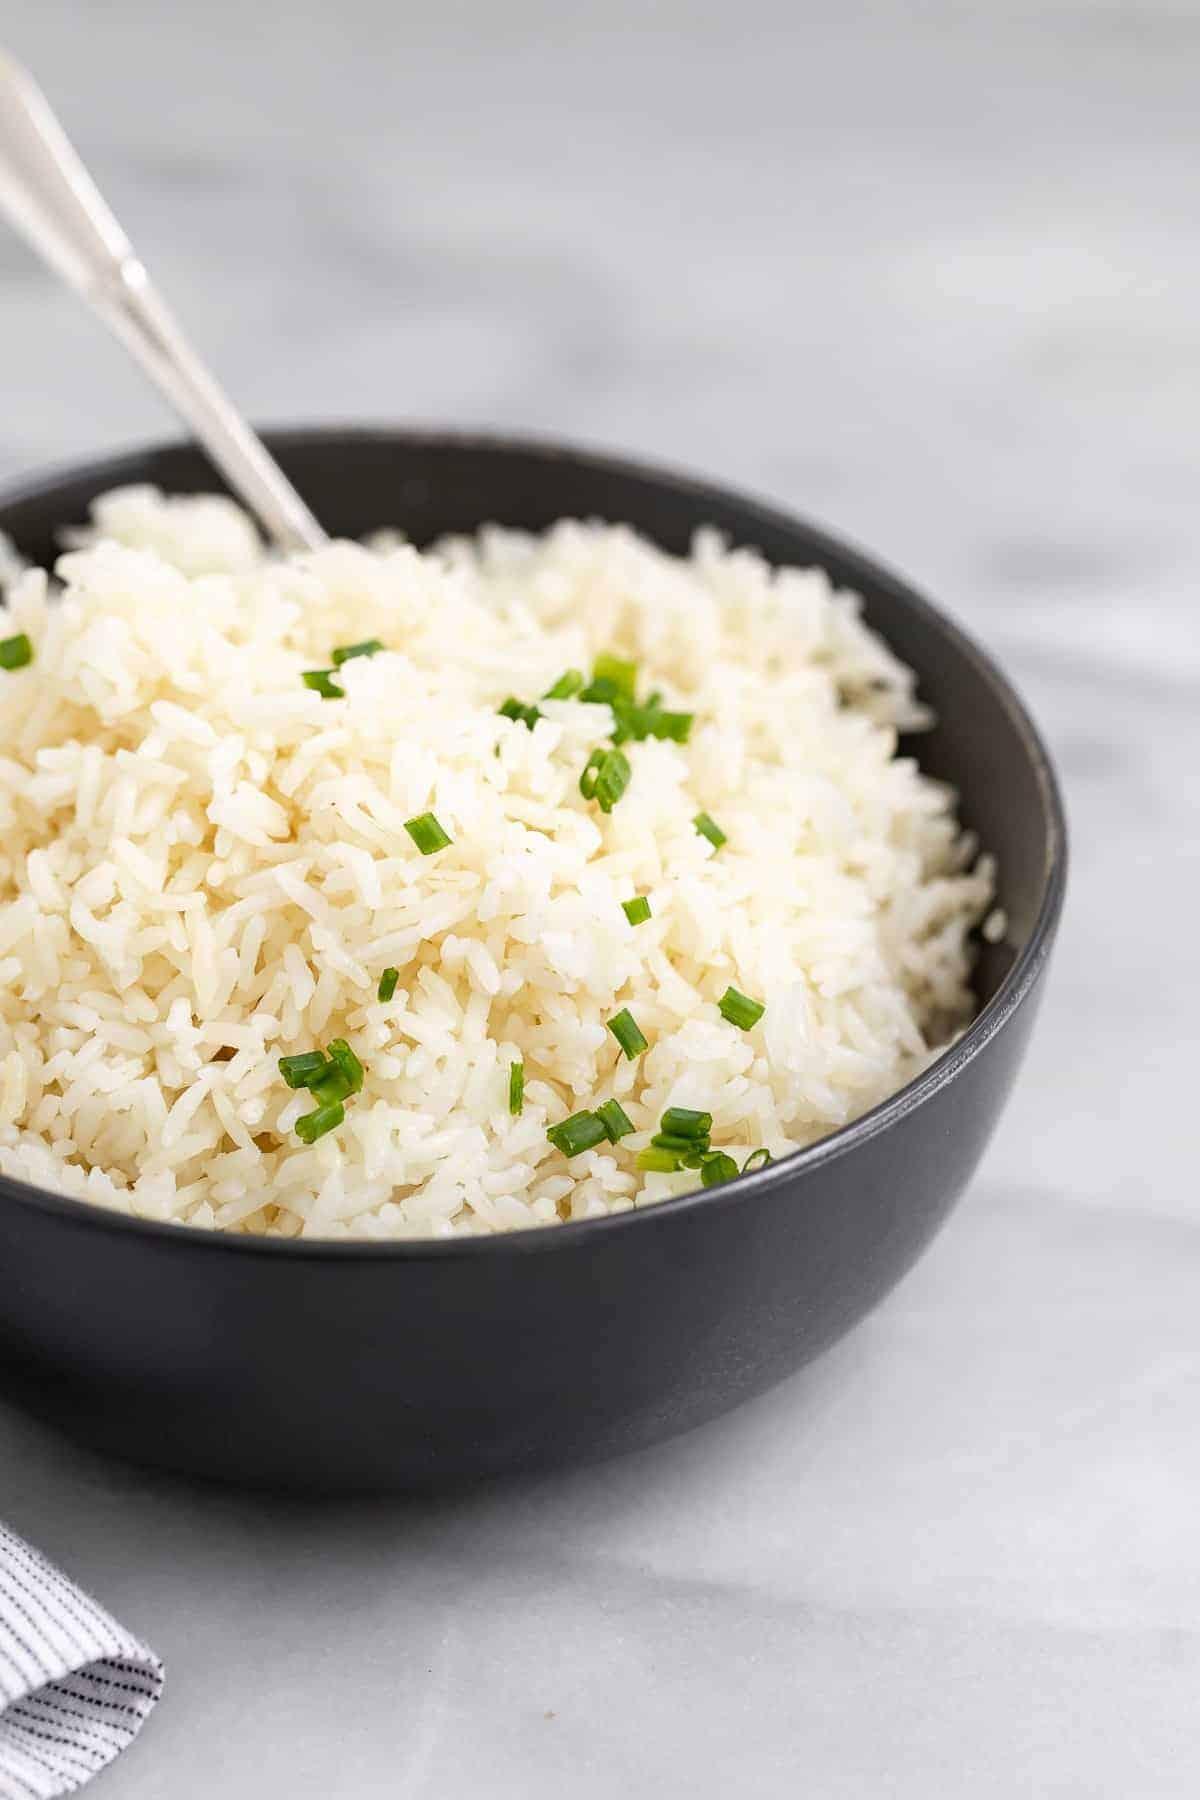 instant pot jasmine rice in a black bowl